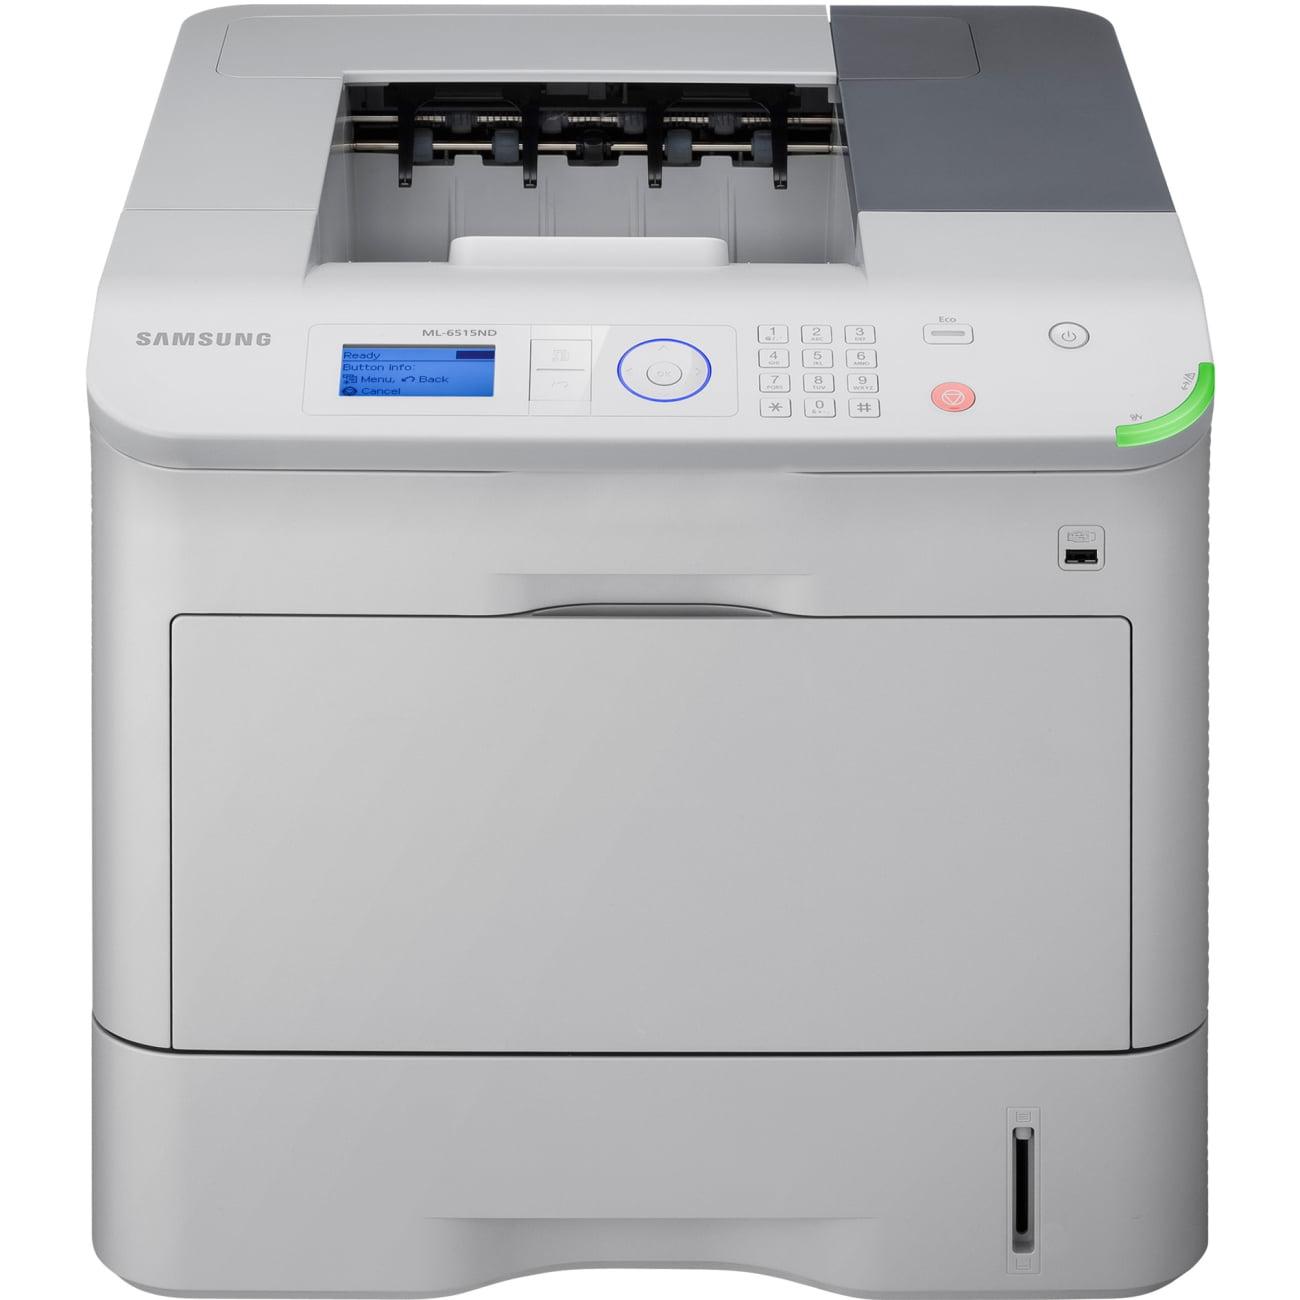 Samsung Proxpress Ml-6515nd Laser Printer - Monochrome - ...